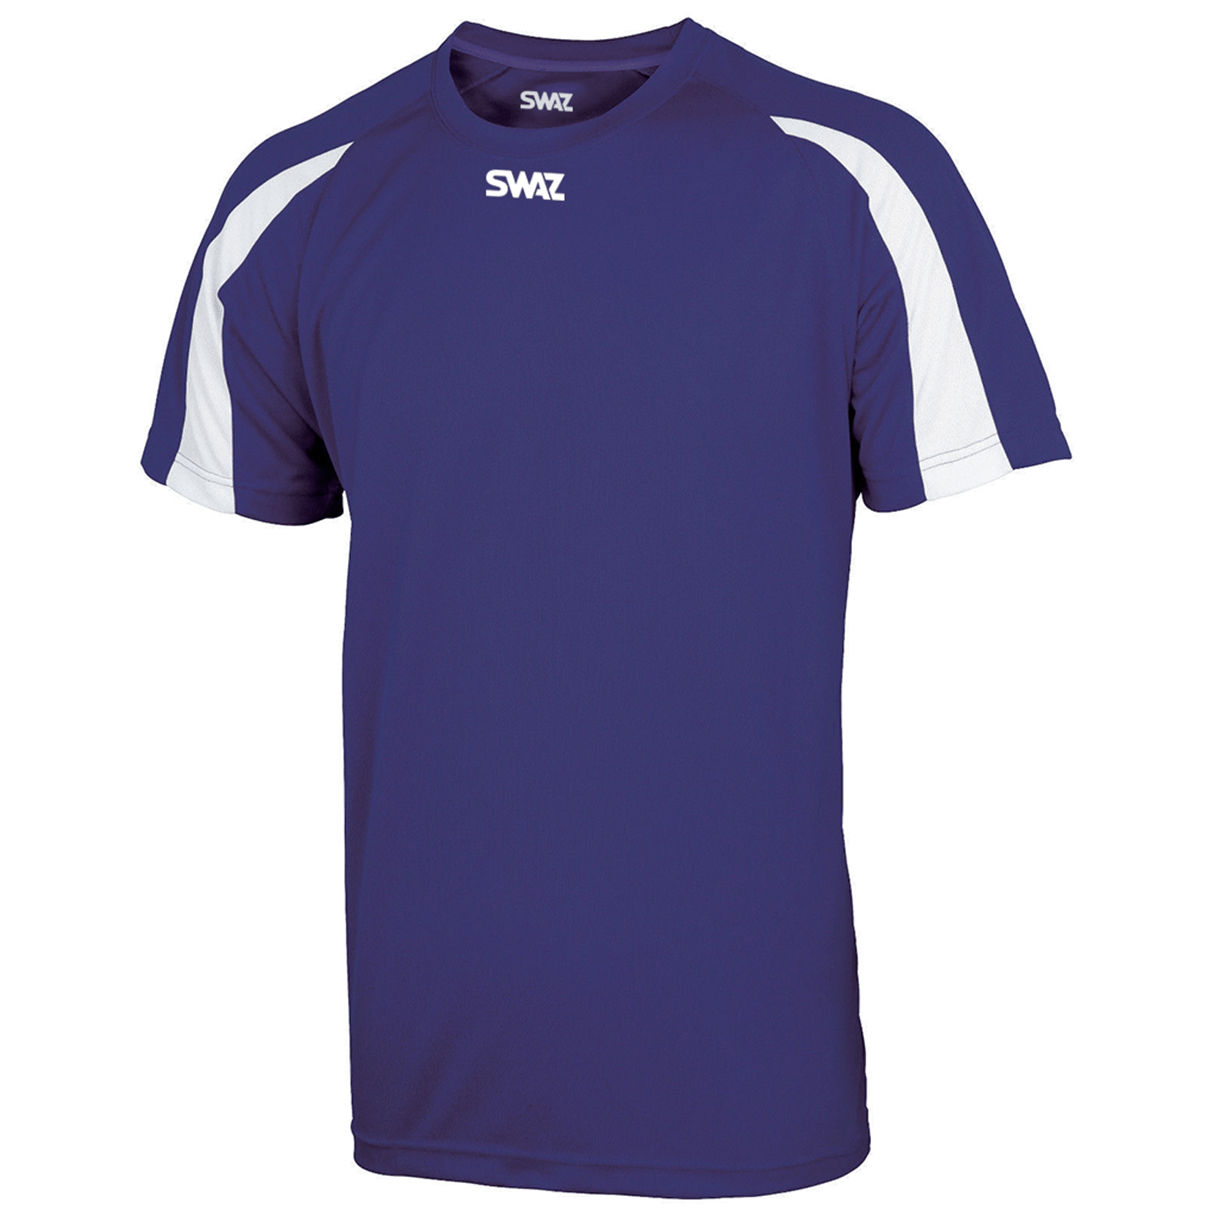 Youth Football Training Shirt